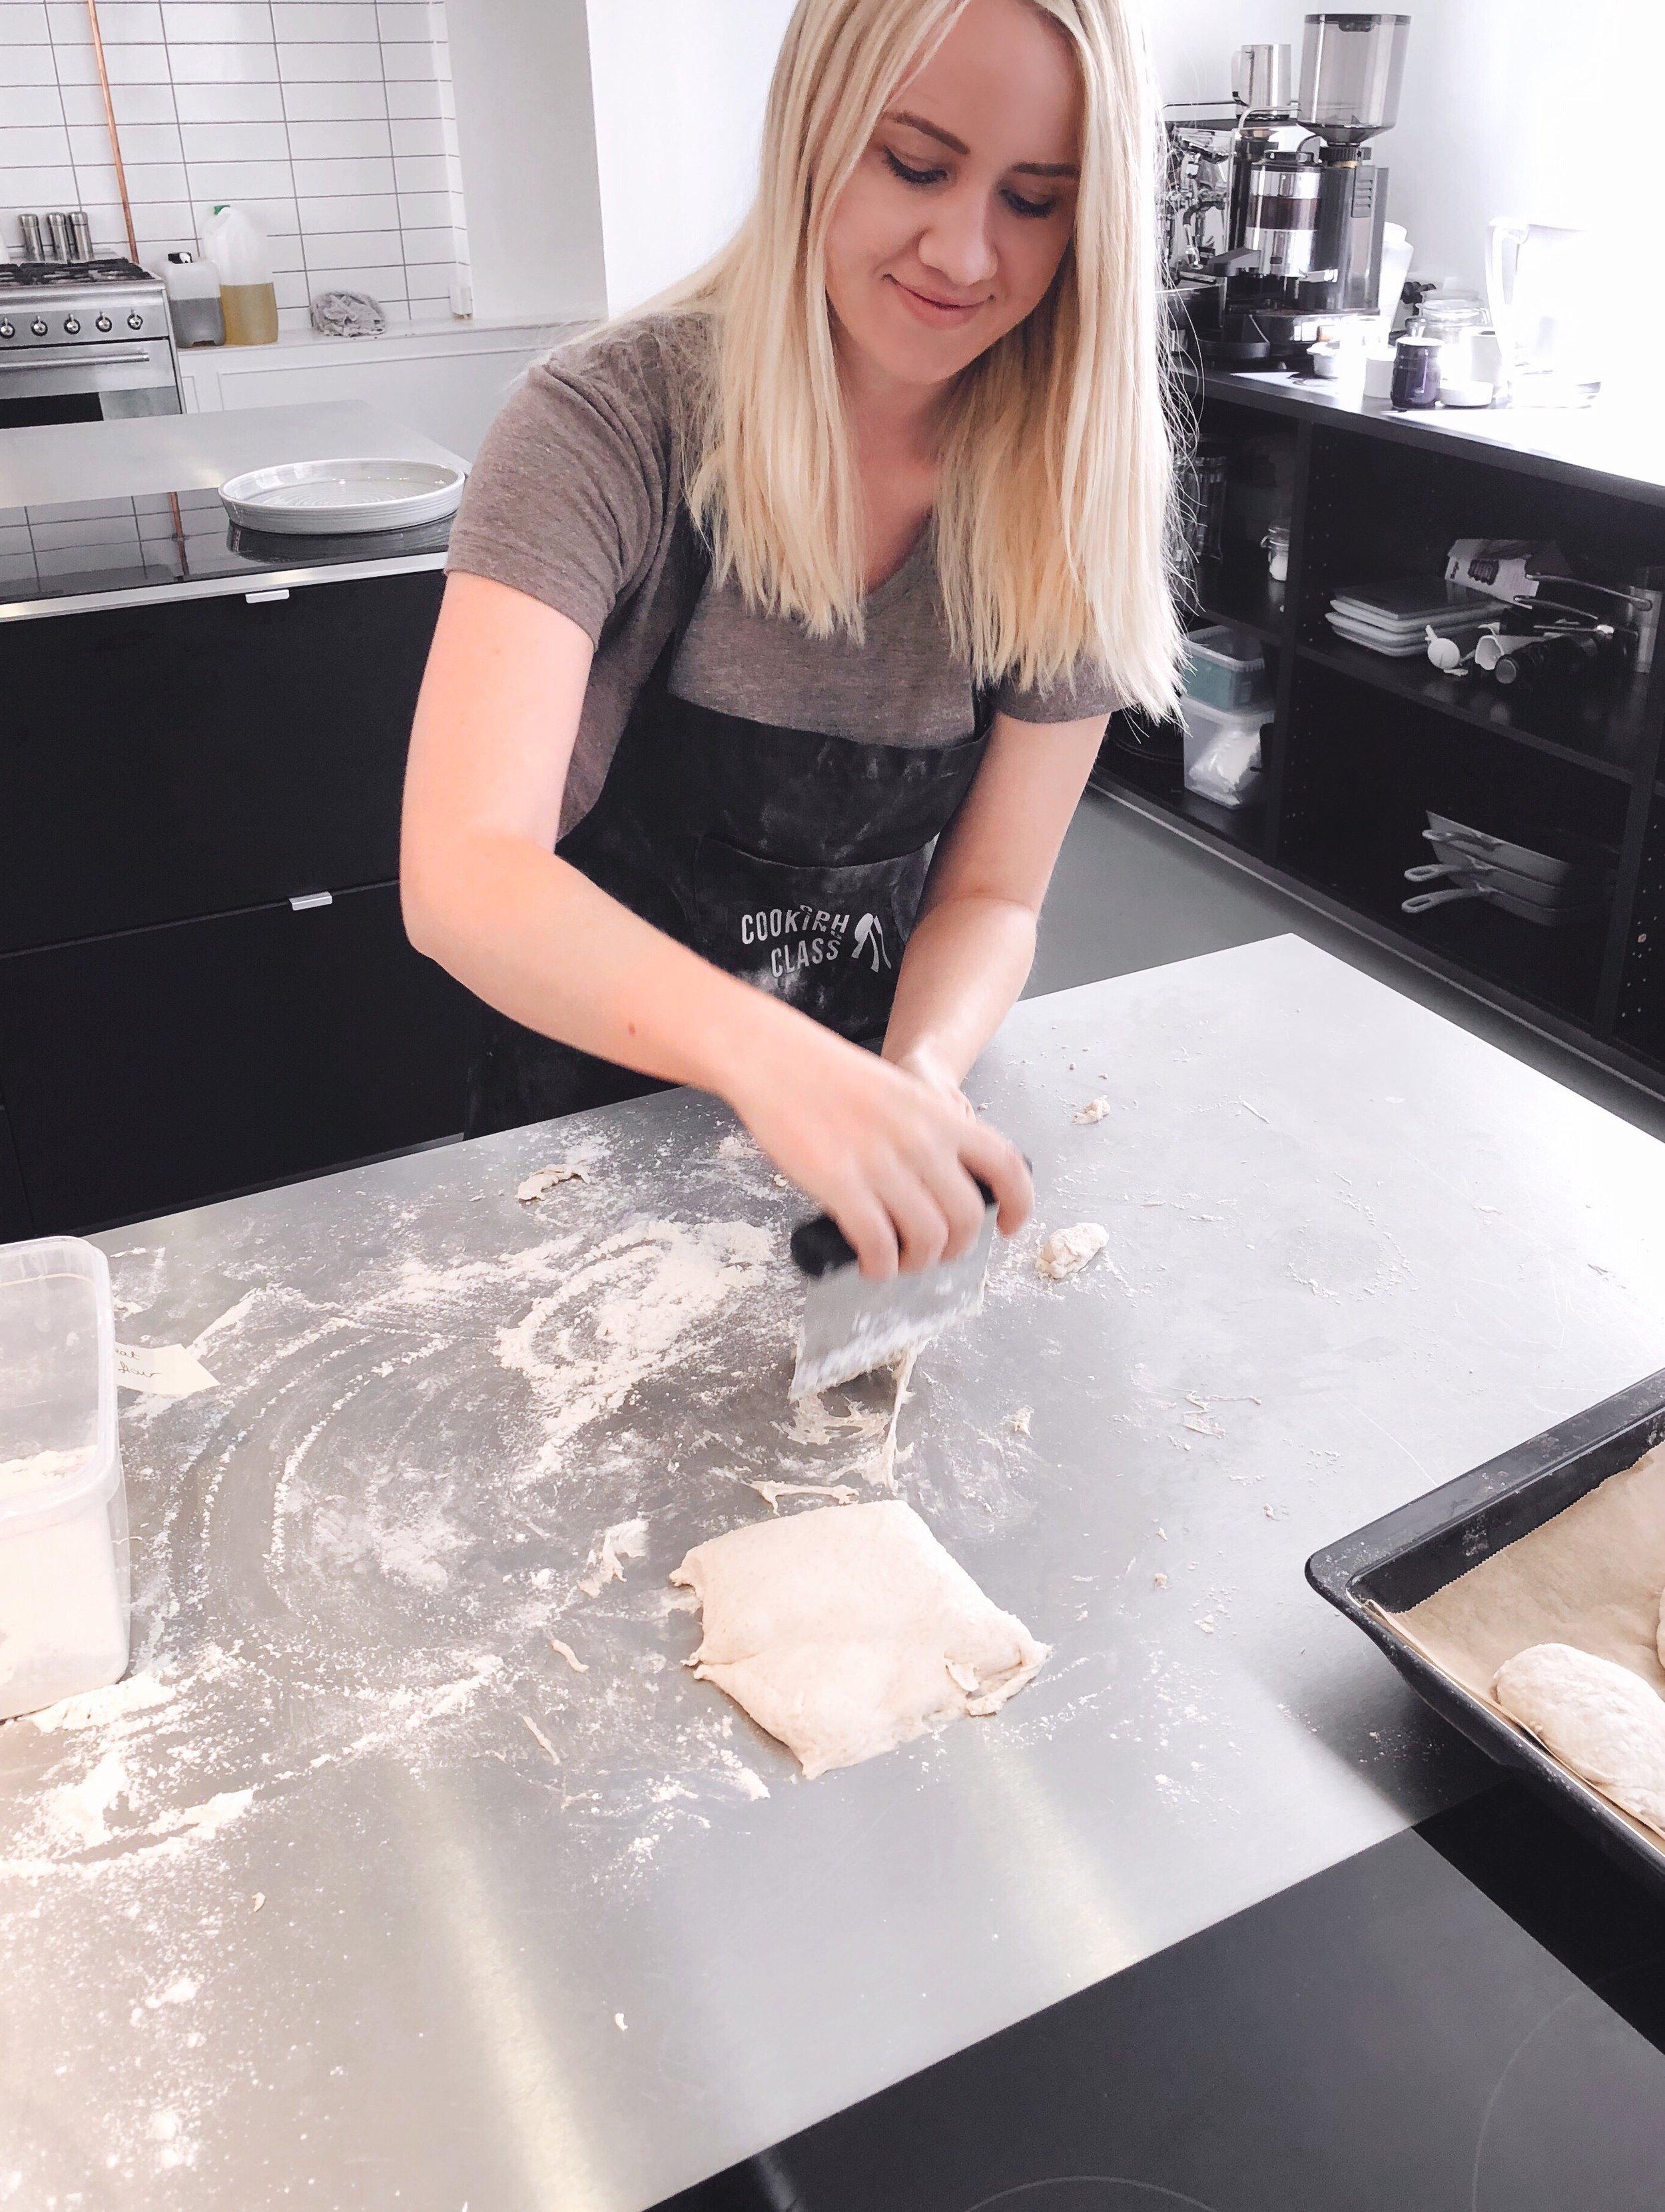 CPH_Cooking_Class